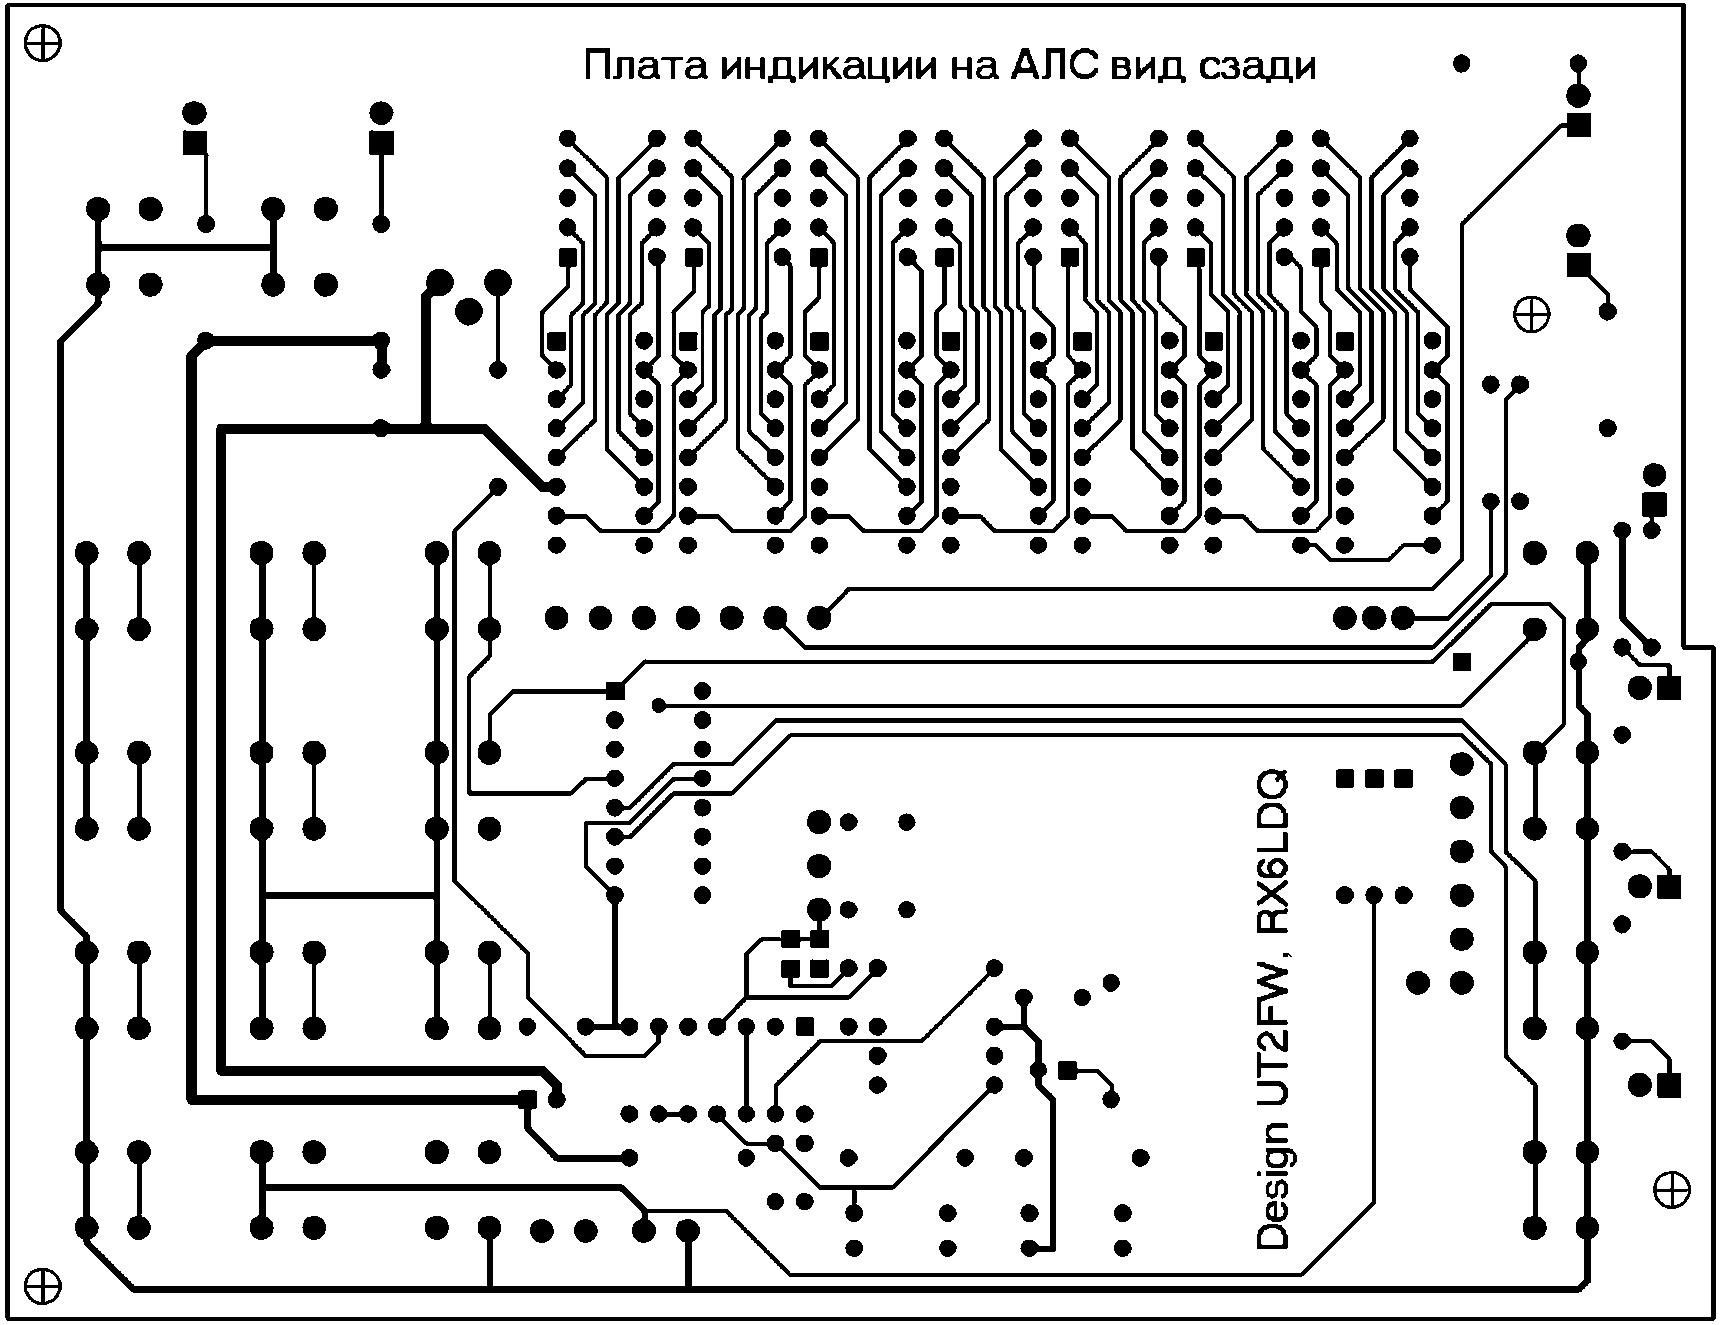 таймер терморегулятор прошивка схема плата